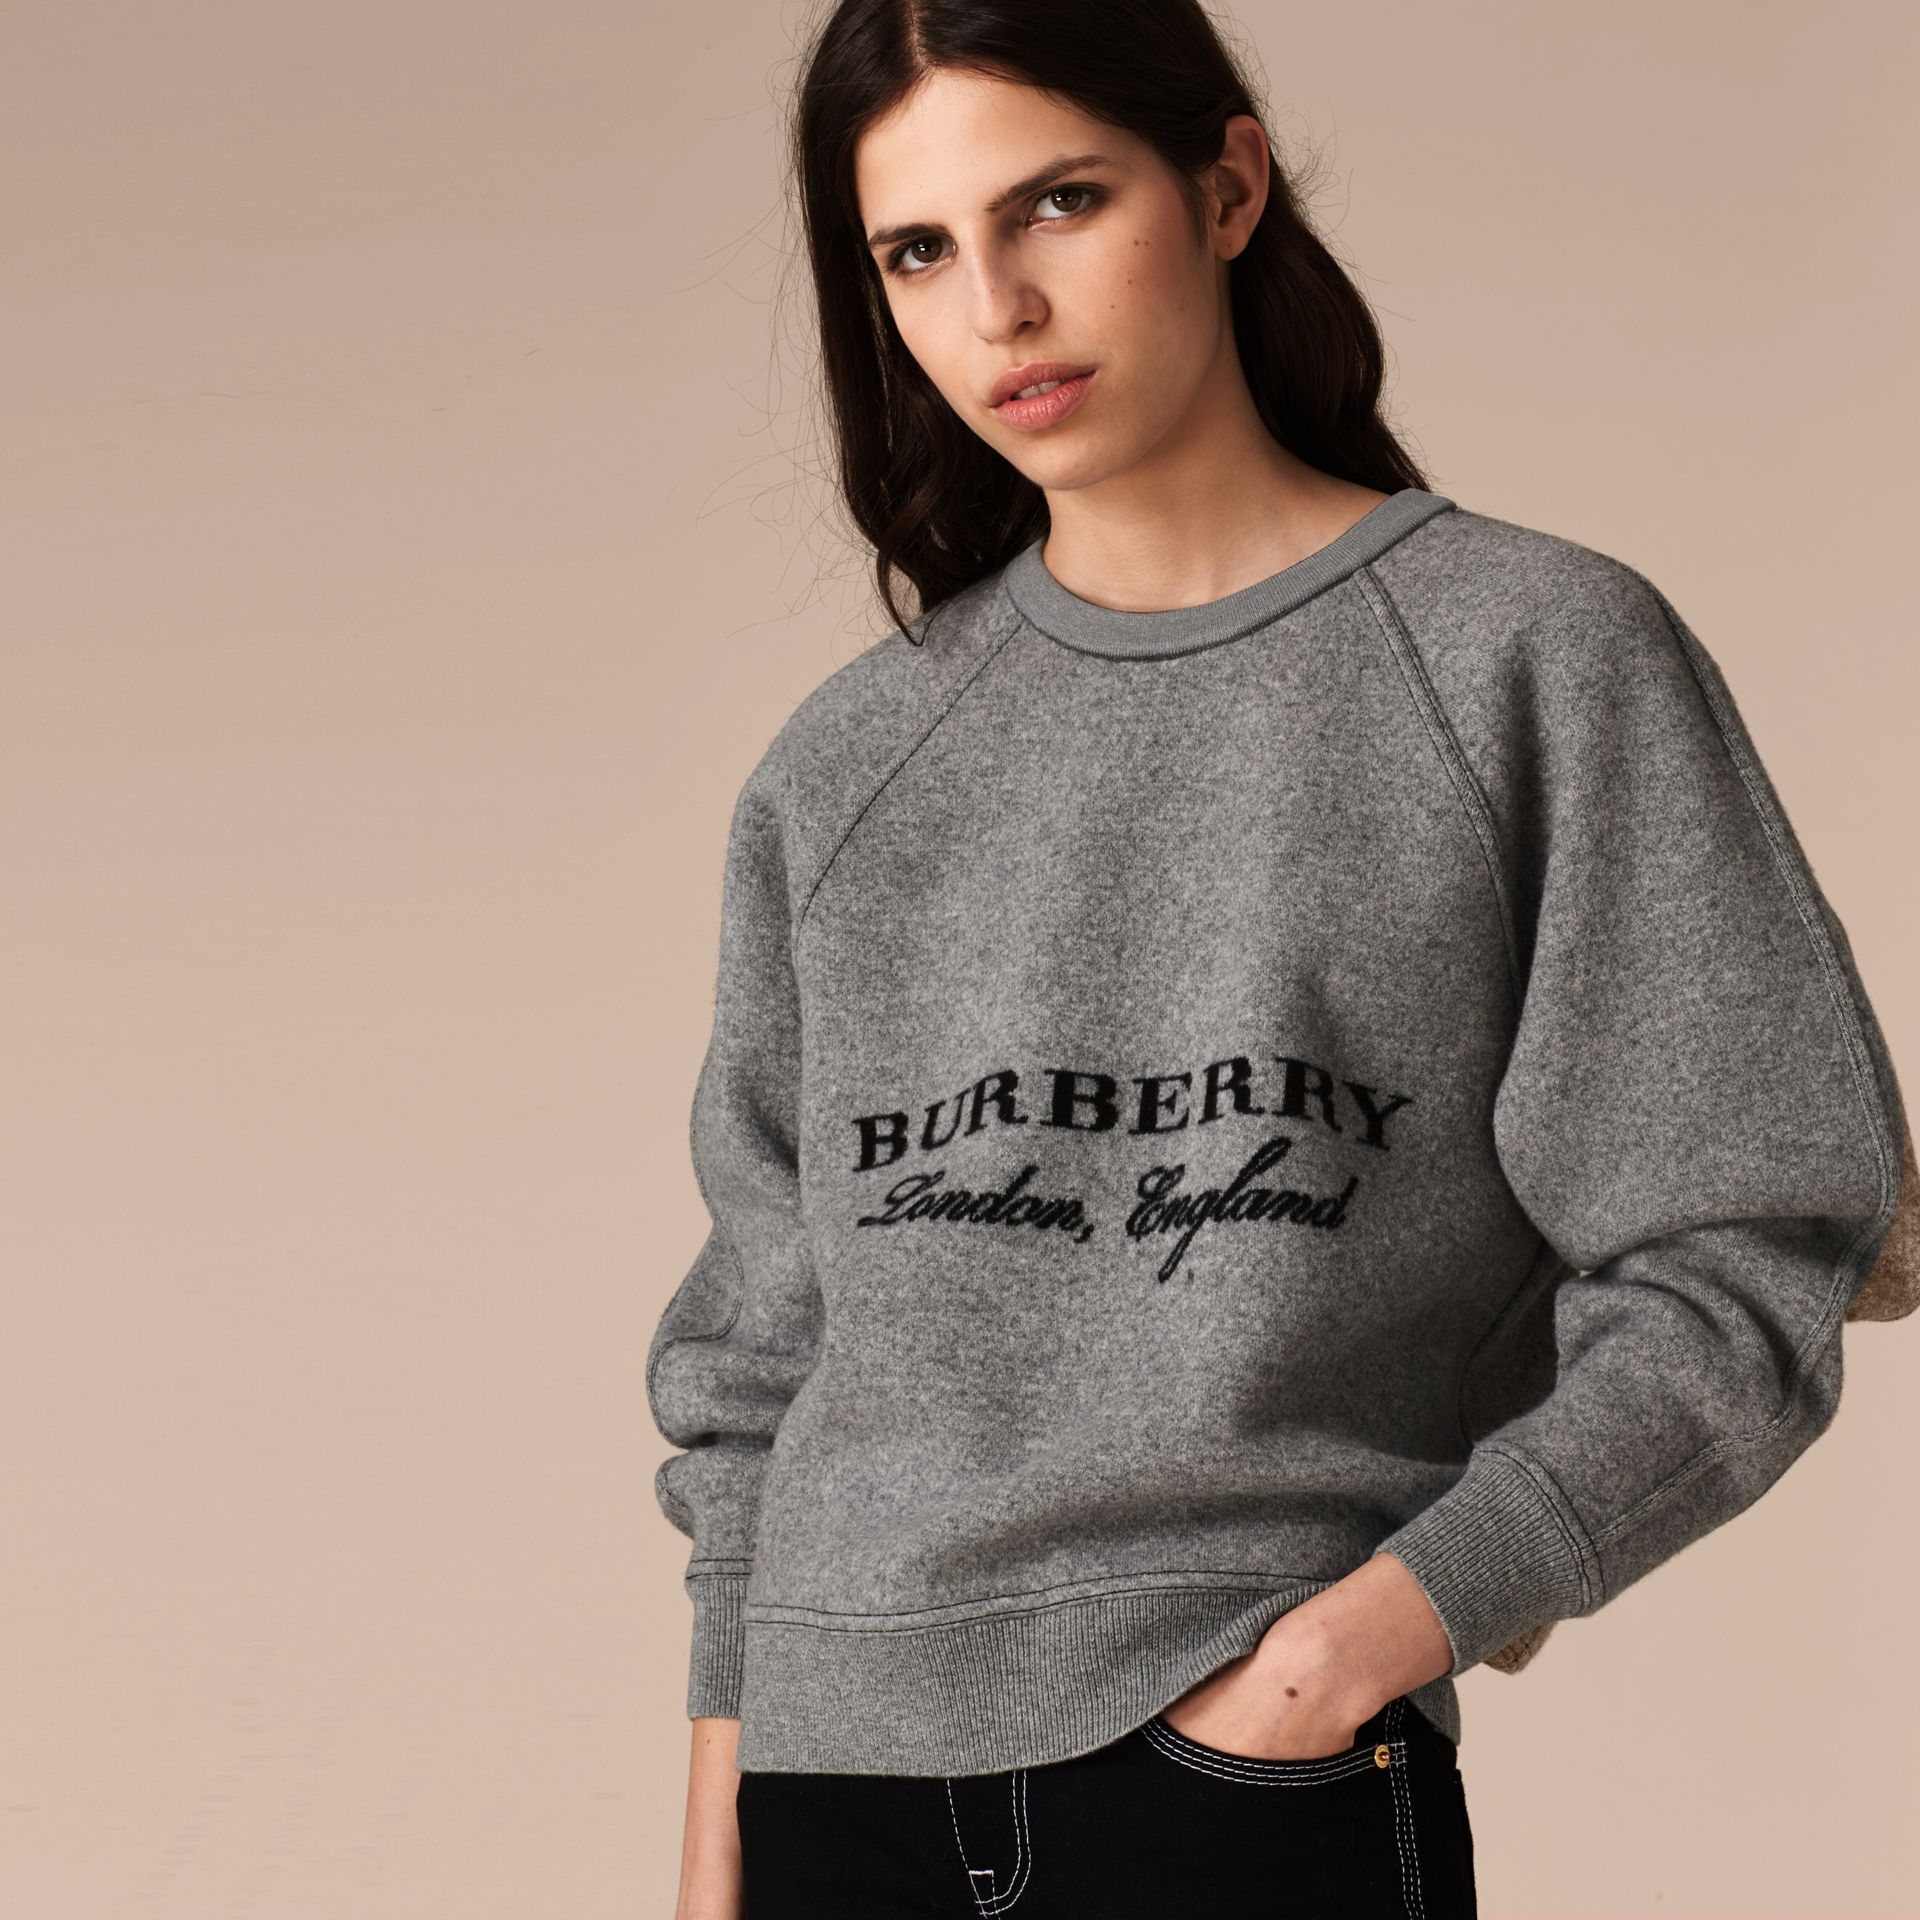 Grigio medio mélange/nero Pullover strutturato in lana e cashmere Grigio Medio Mélange/nero - immagine della galleria 5